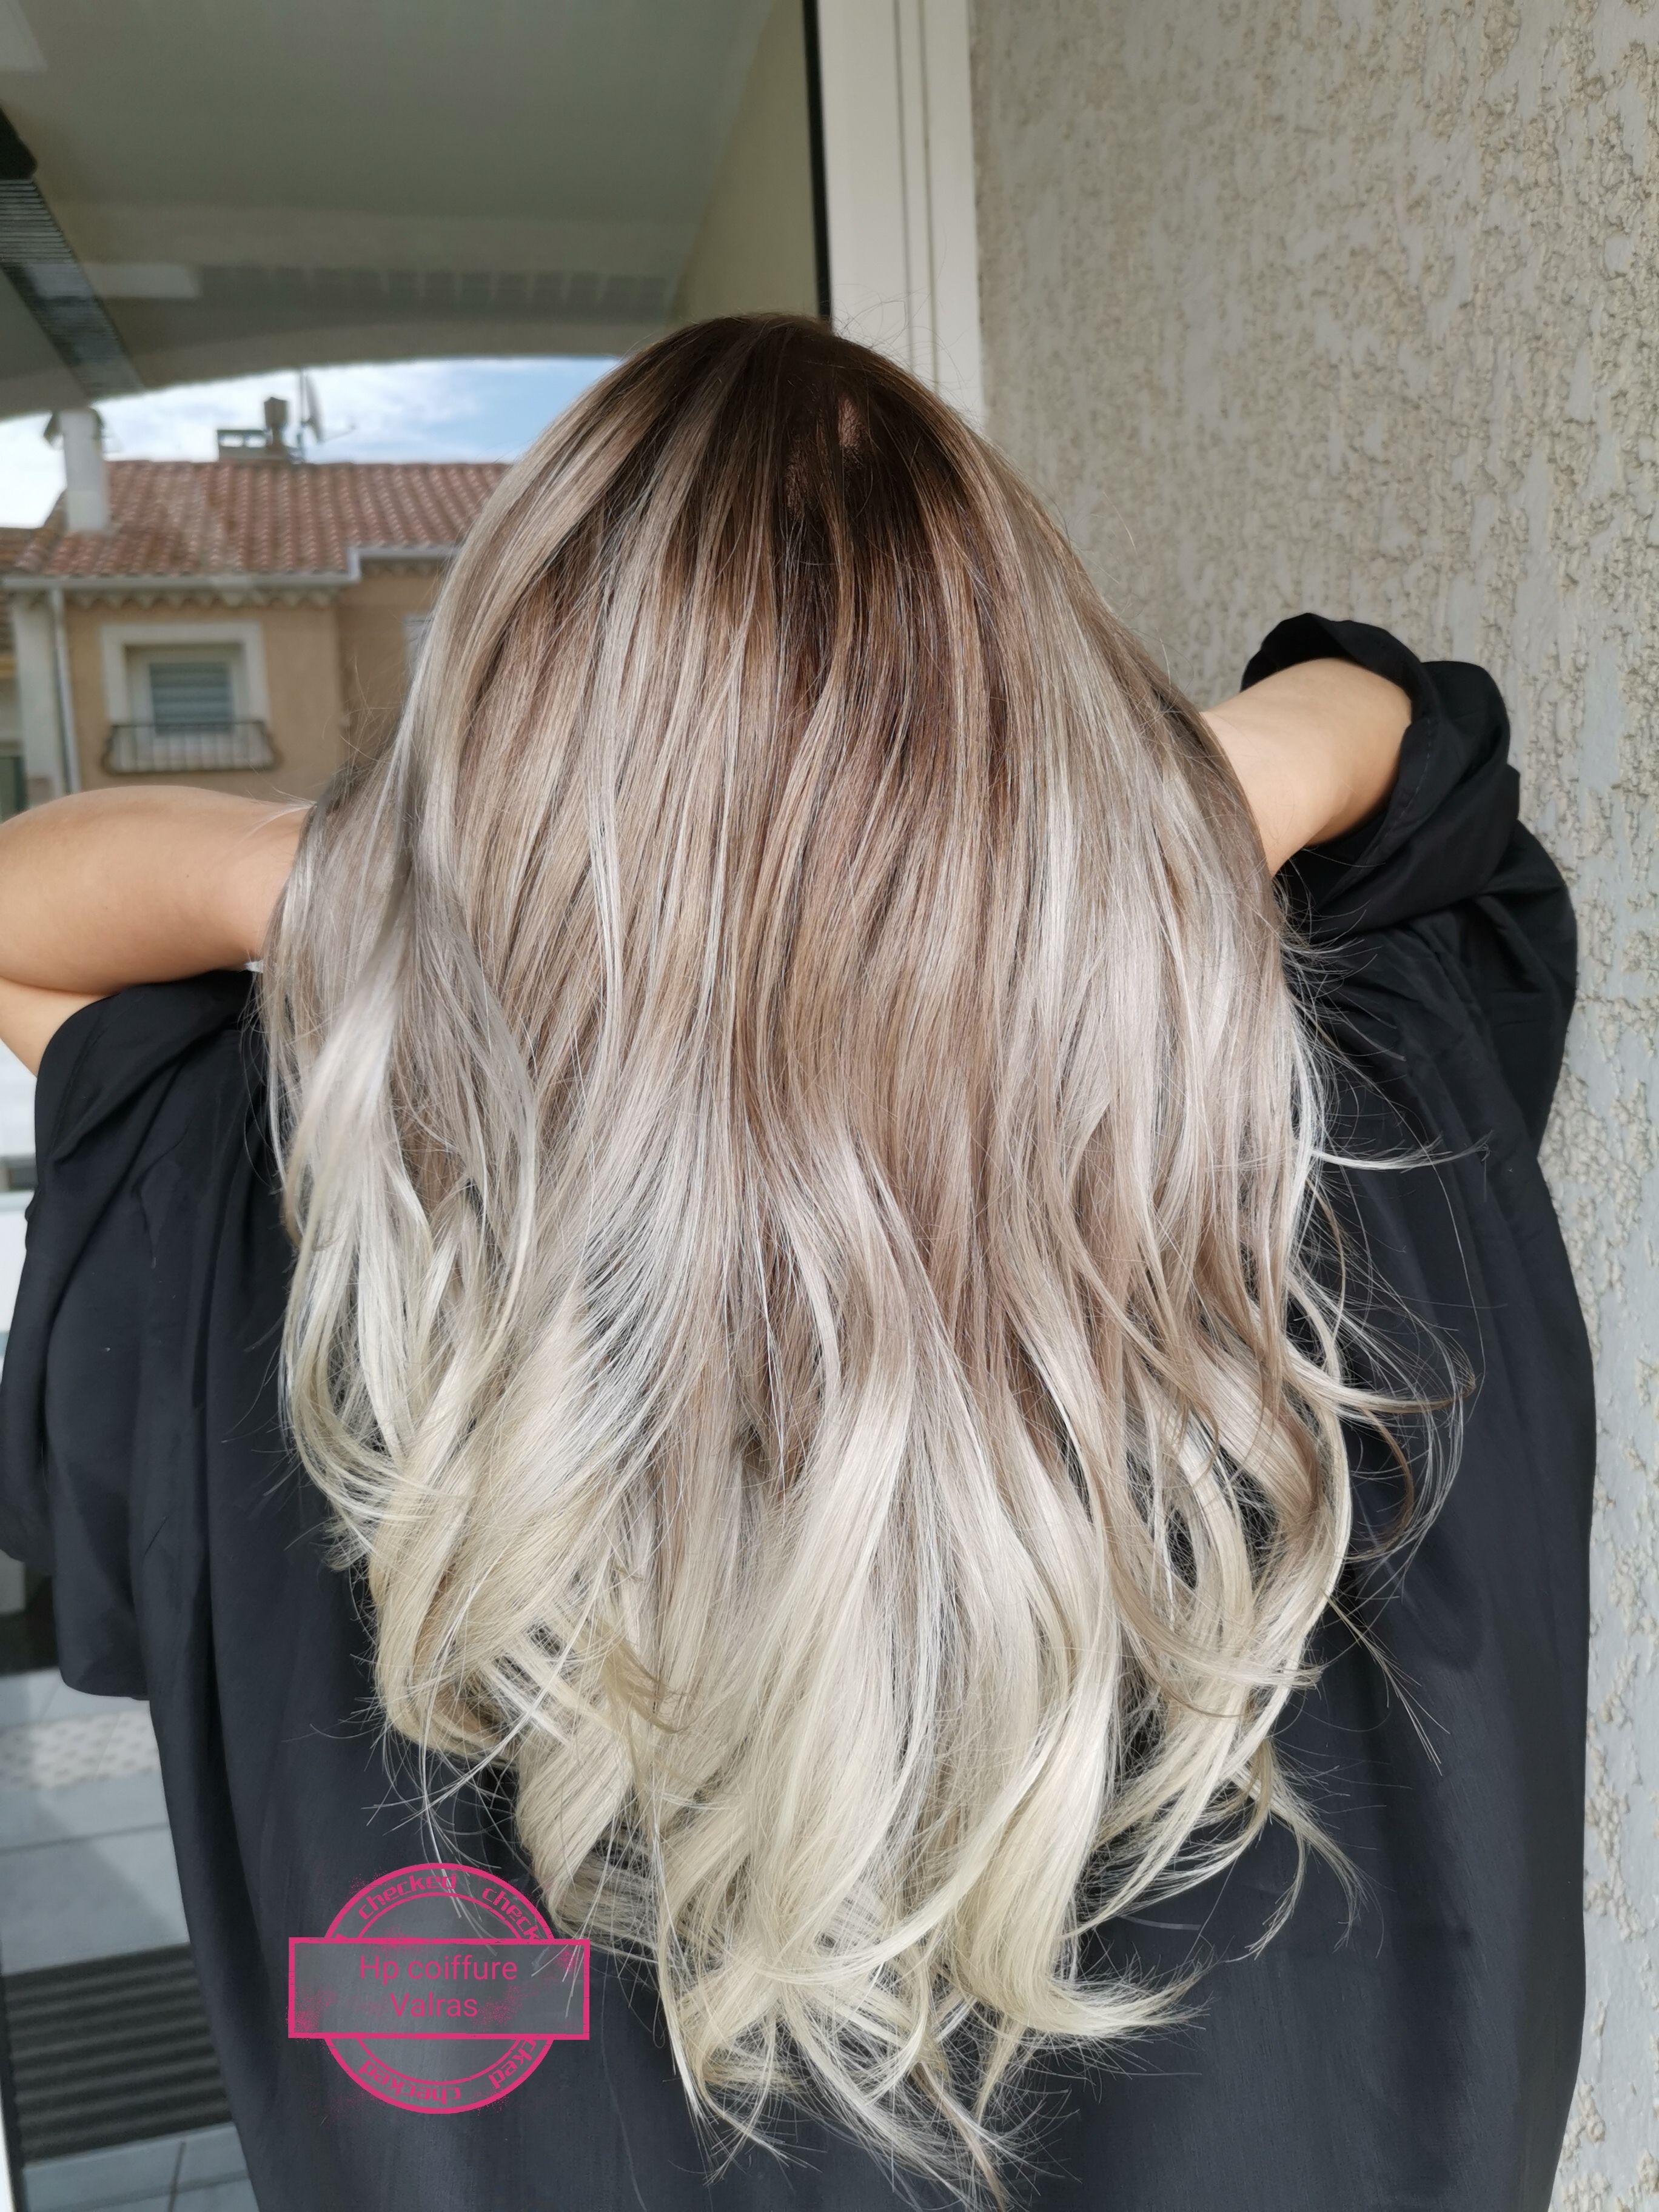 Epingle Sur Color Hair By Hpcoiffurevalras